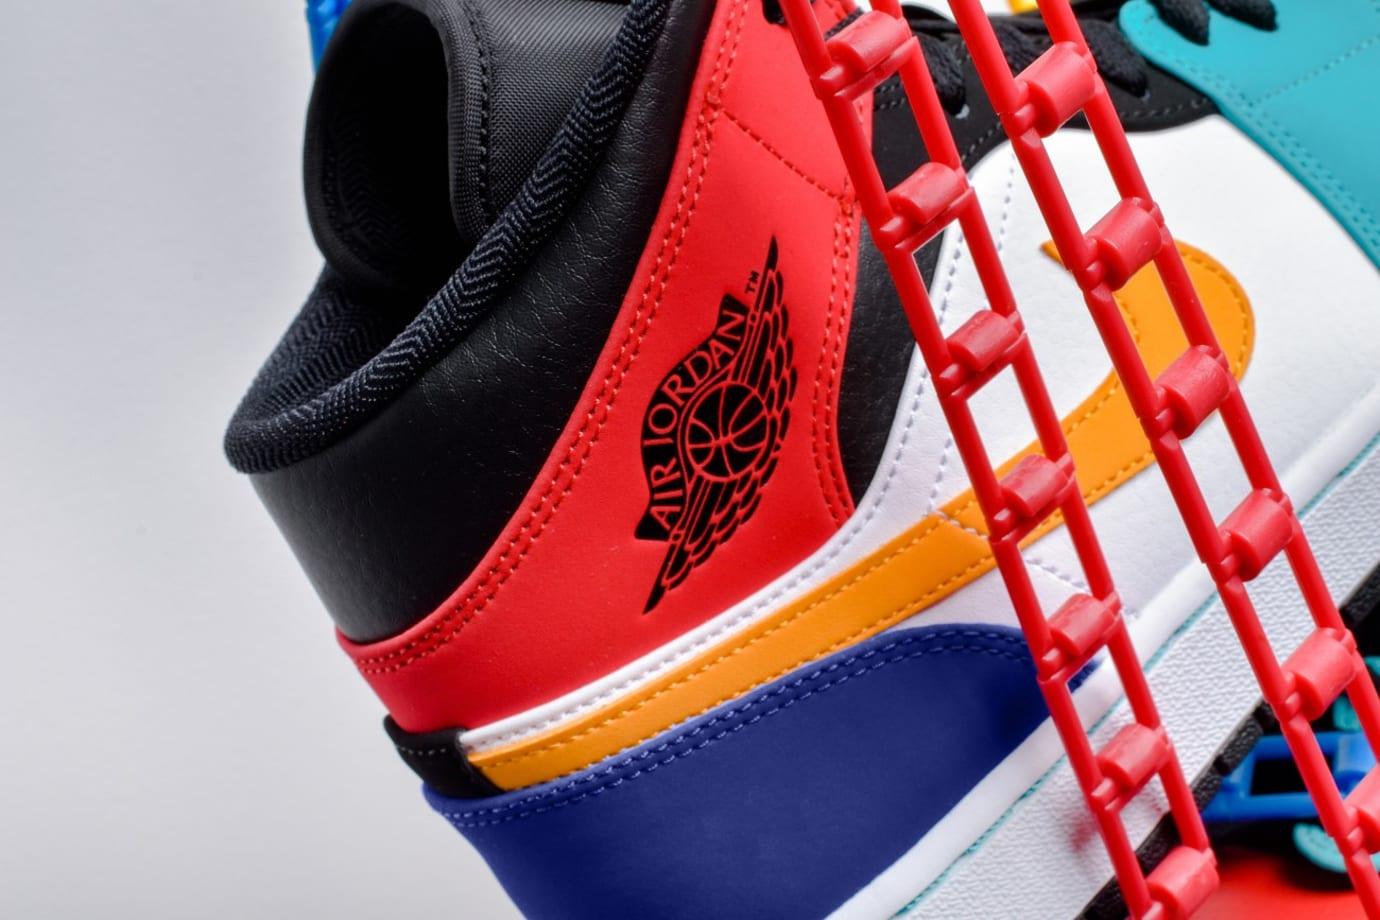 b014f7ef2633 1 NowSole 'multicolor' Air Jordan Mid Available 125 Collector 554724 qSVUpzM